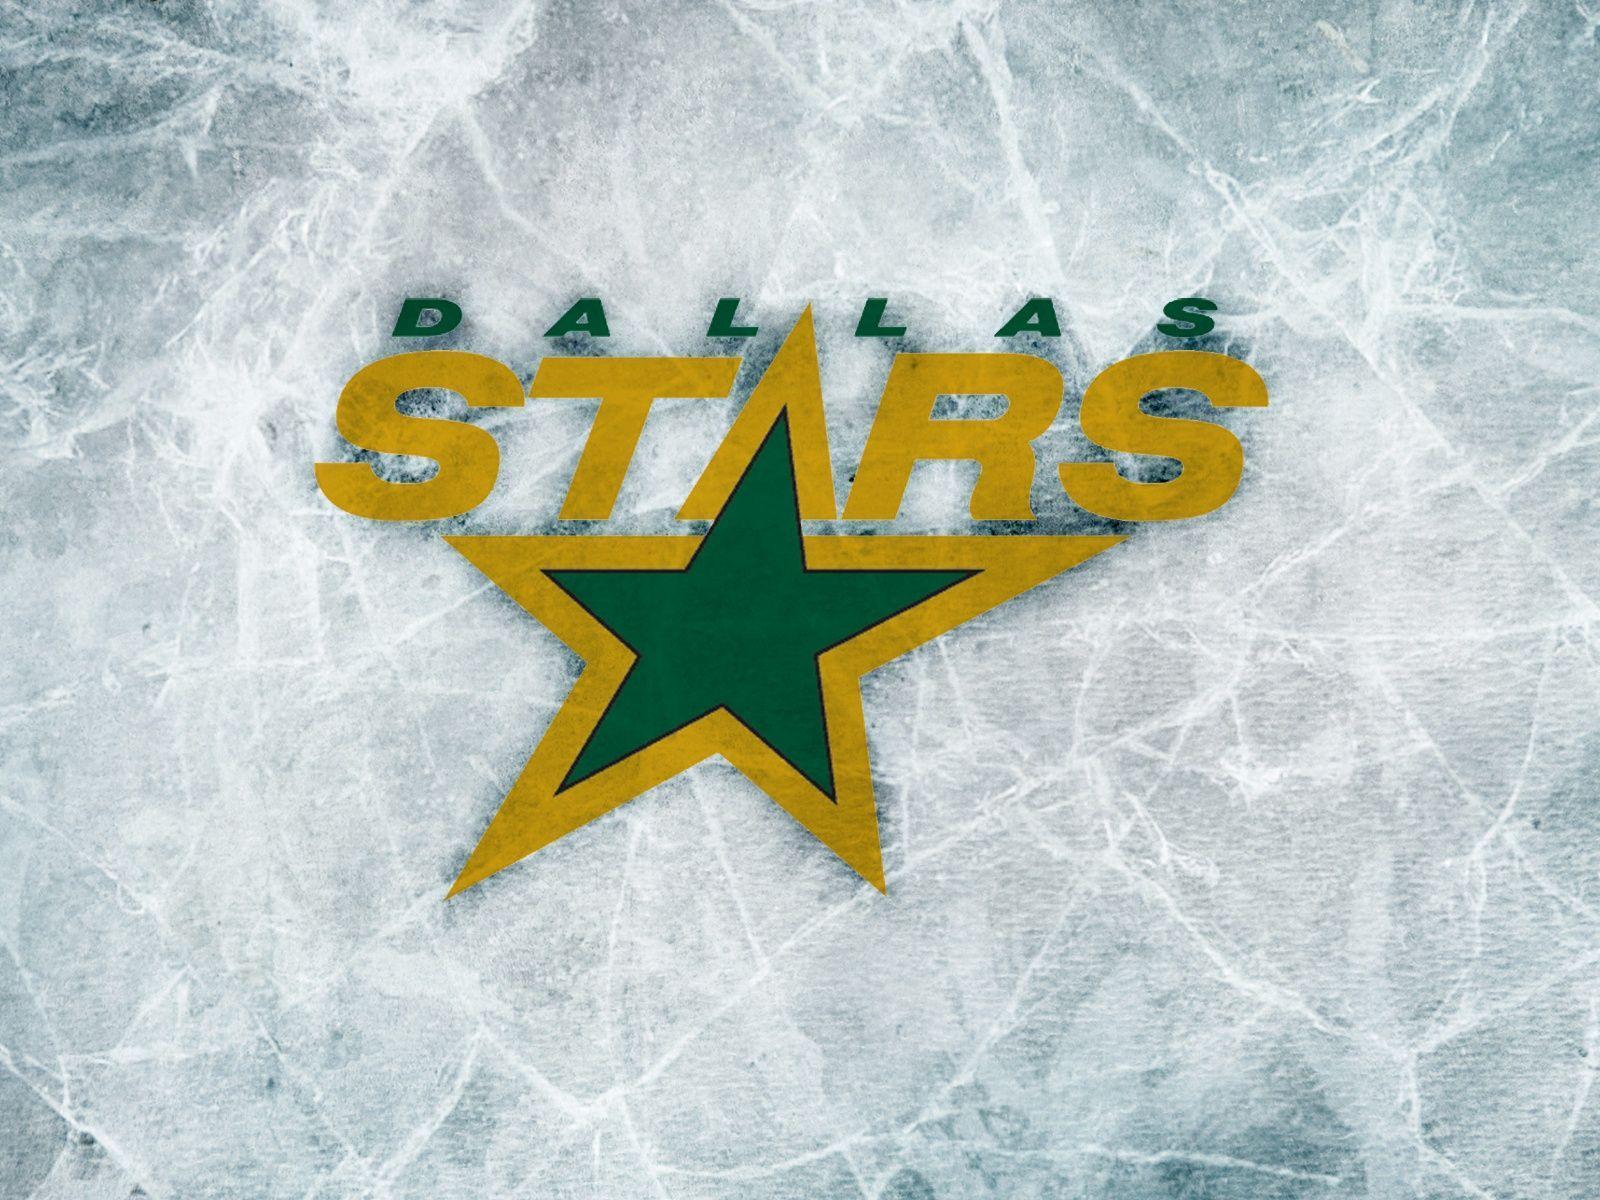 Dallas Stars Wallpapers HD | PixelsTalk.Net